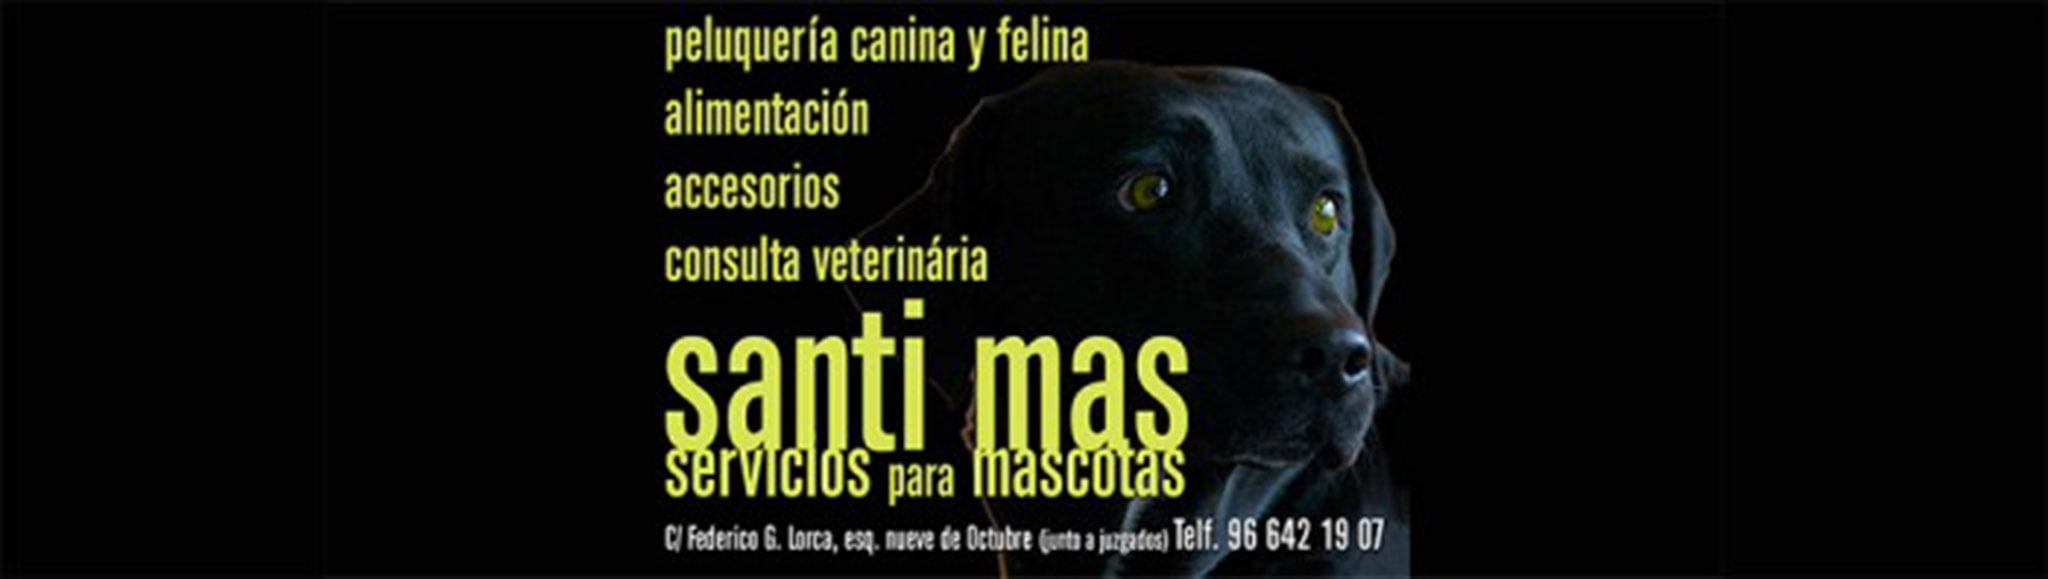 Santi Mas Logo - Pet Services